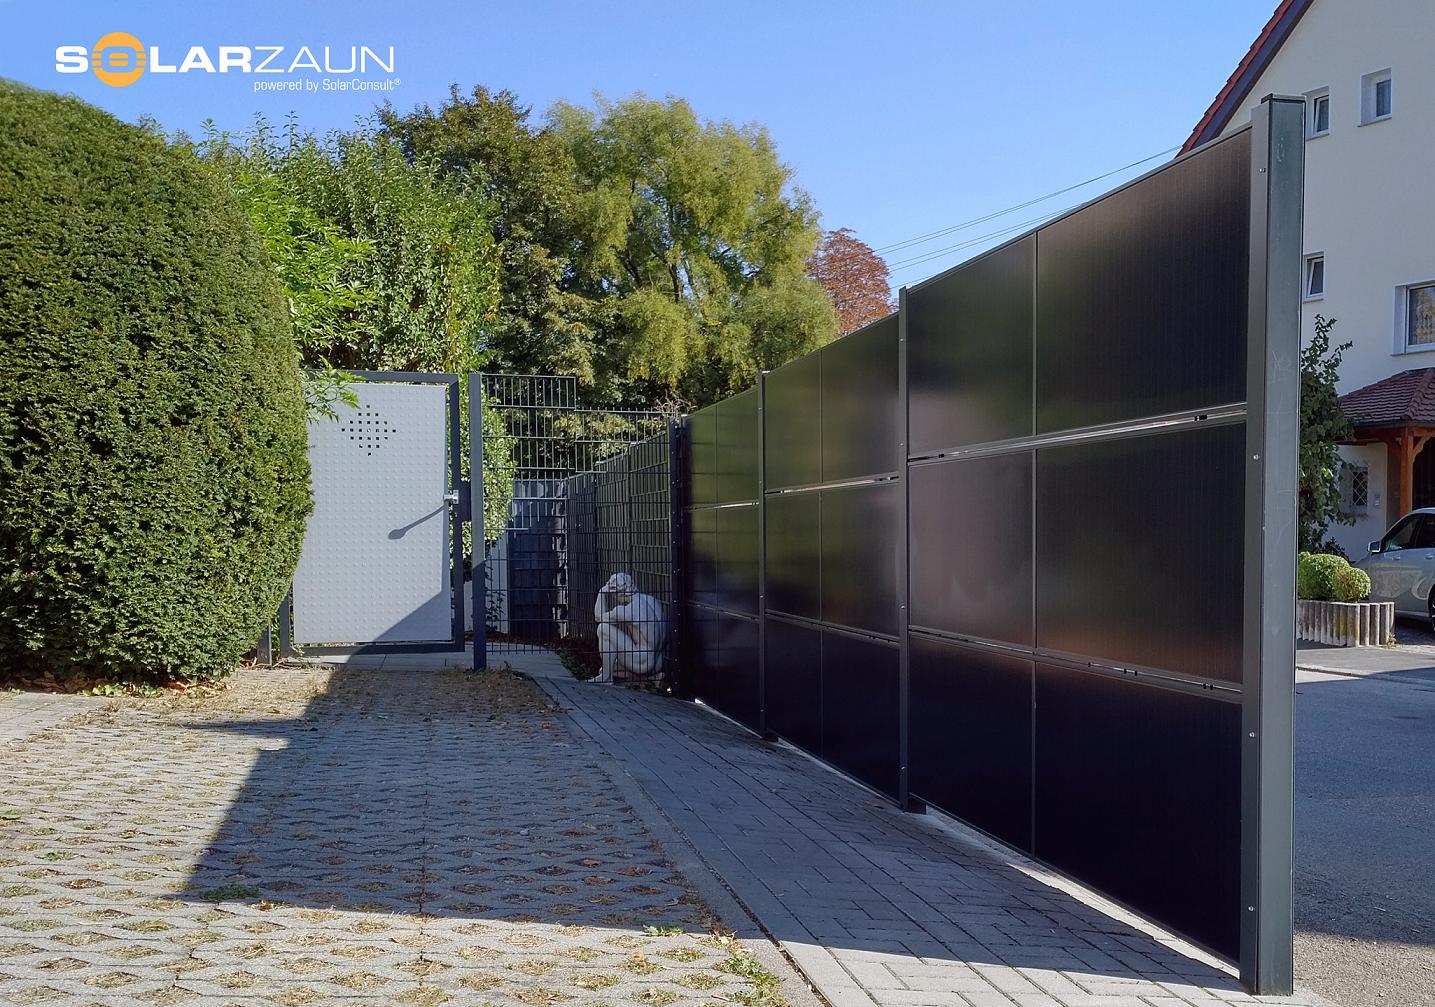 solarzaun, solar zaun